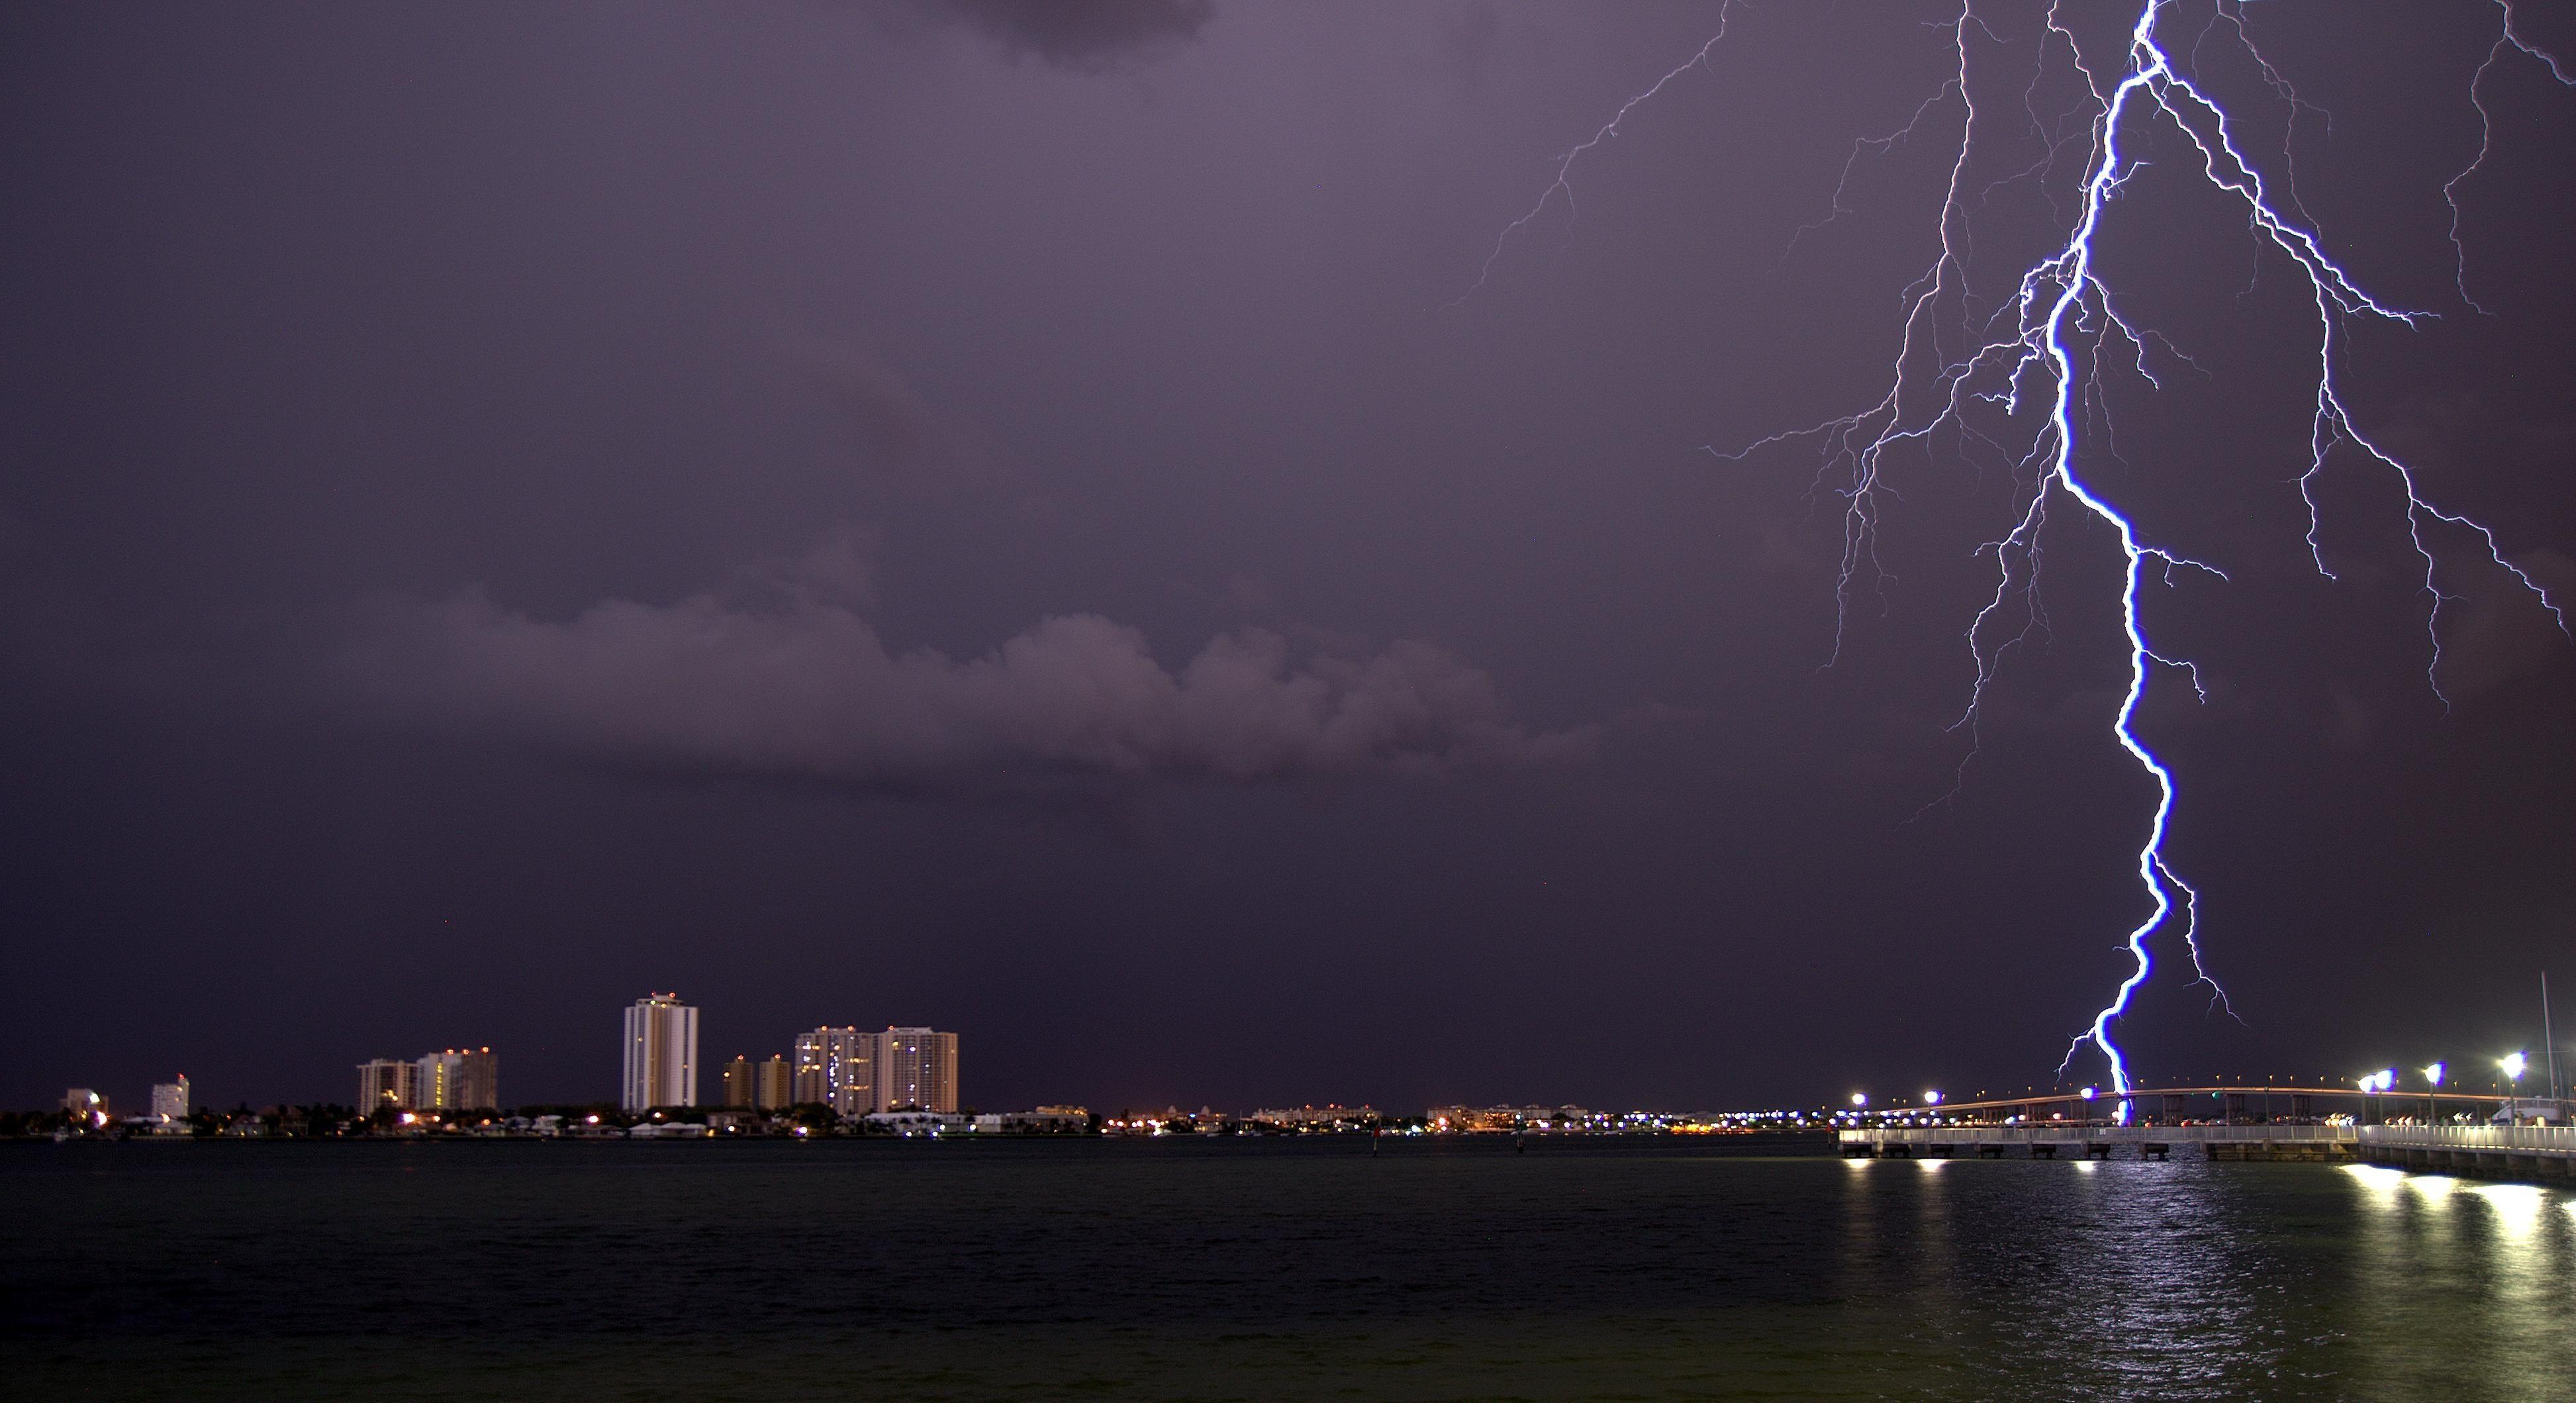 Free Download Pictures Of Lightning Lightning Images Pictures Of Lightning Storm Images